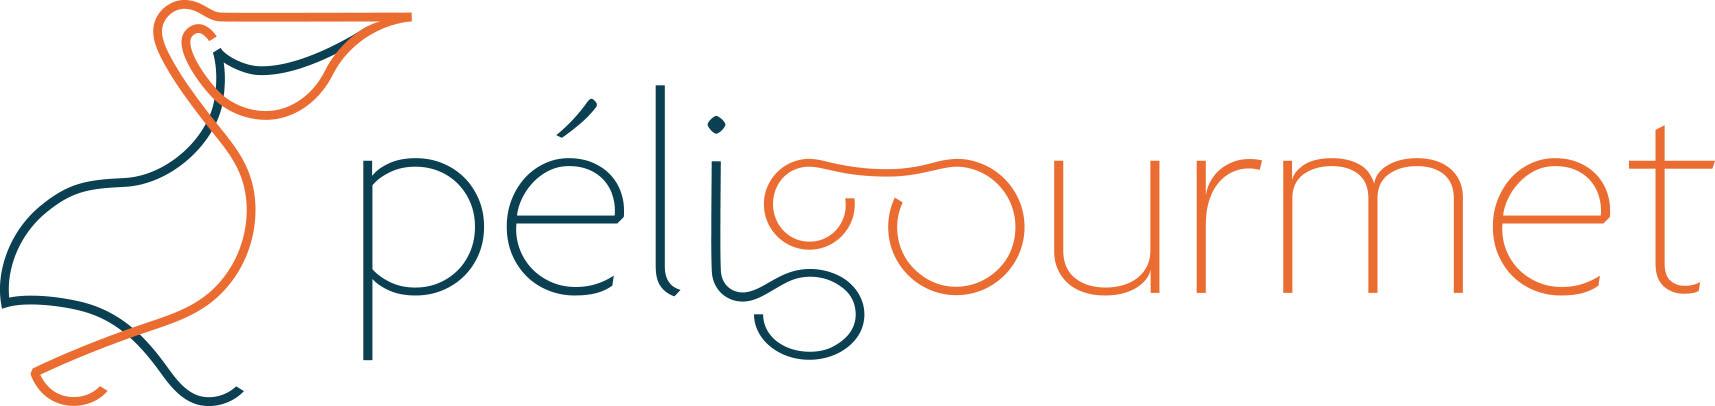 Logo peligourmet fondblanc